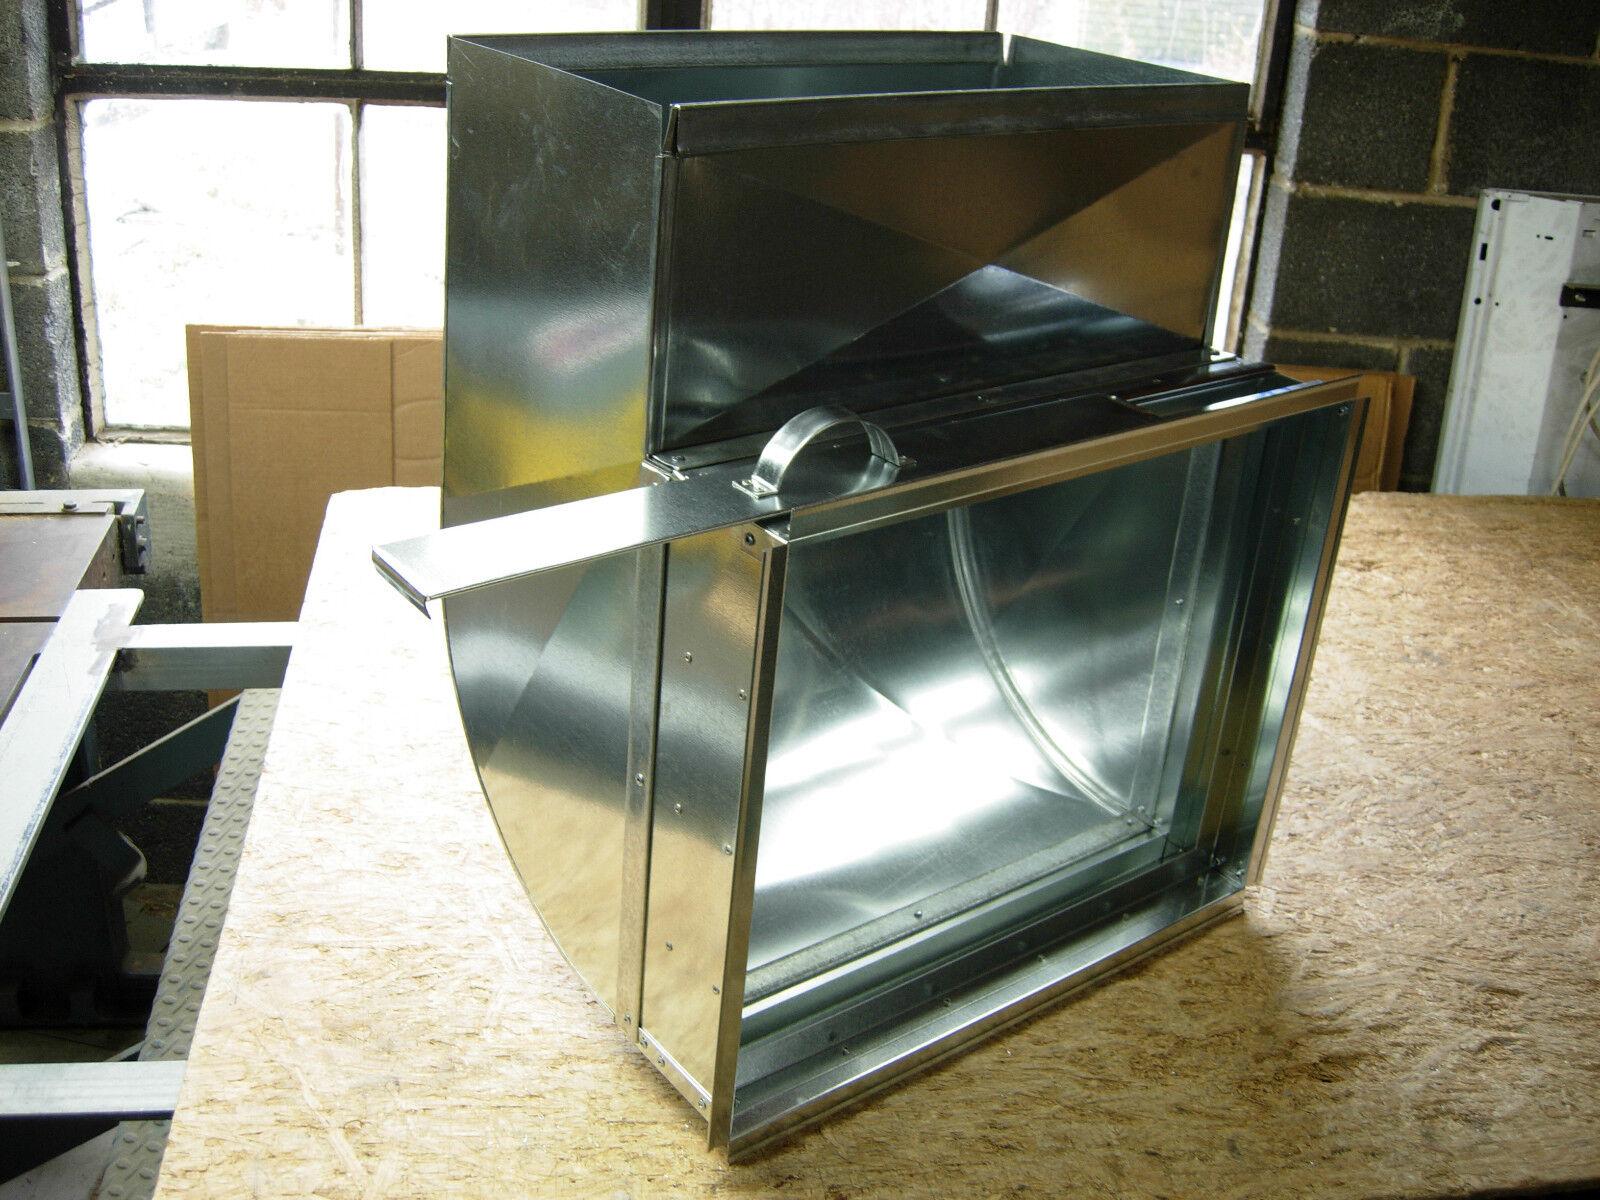 installing filter rack between furnace